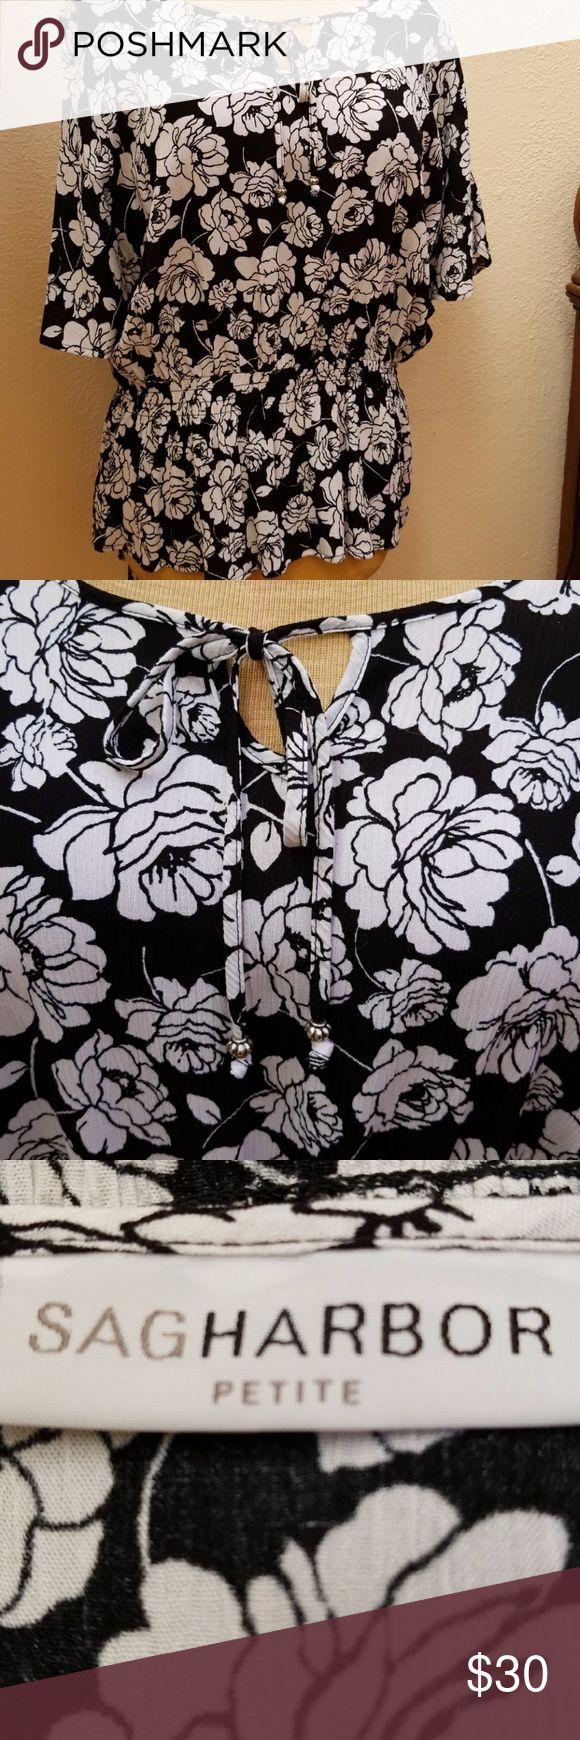 SAGHARBOR Blouse/Top, Petite Large SAGHARBOR Blouse/Top. Size PL, black and white flower print, pullover, elastic waist line, ties at neckline in front. SAGHARBOR Tops Blouses